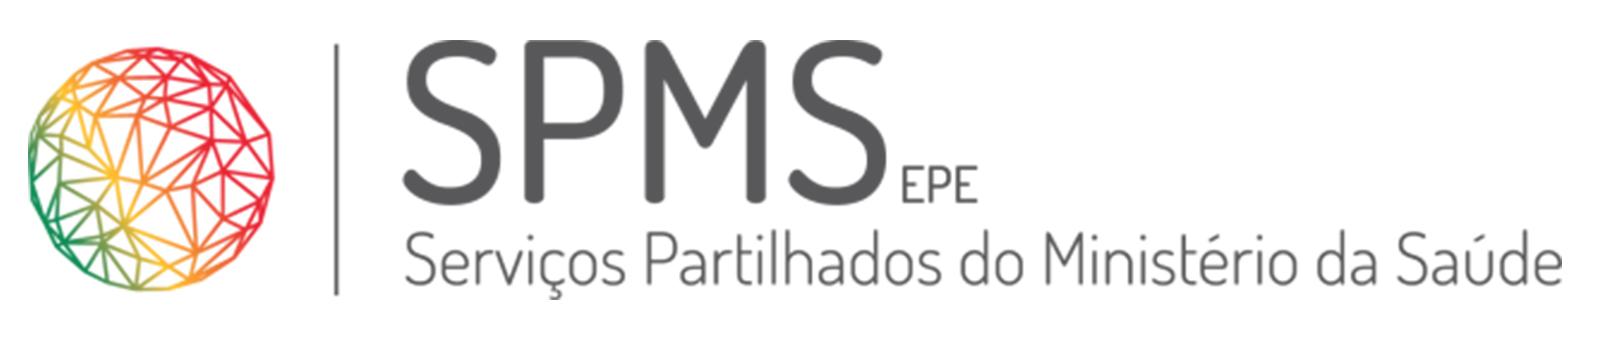 logo SPMS pagina entidade